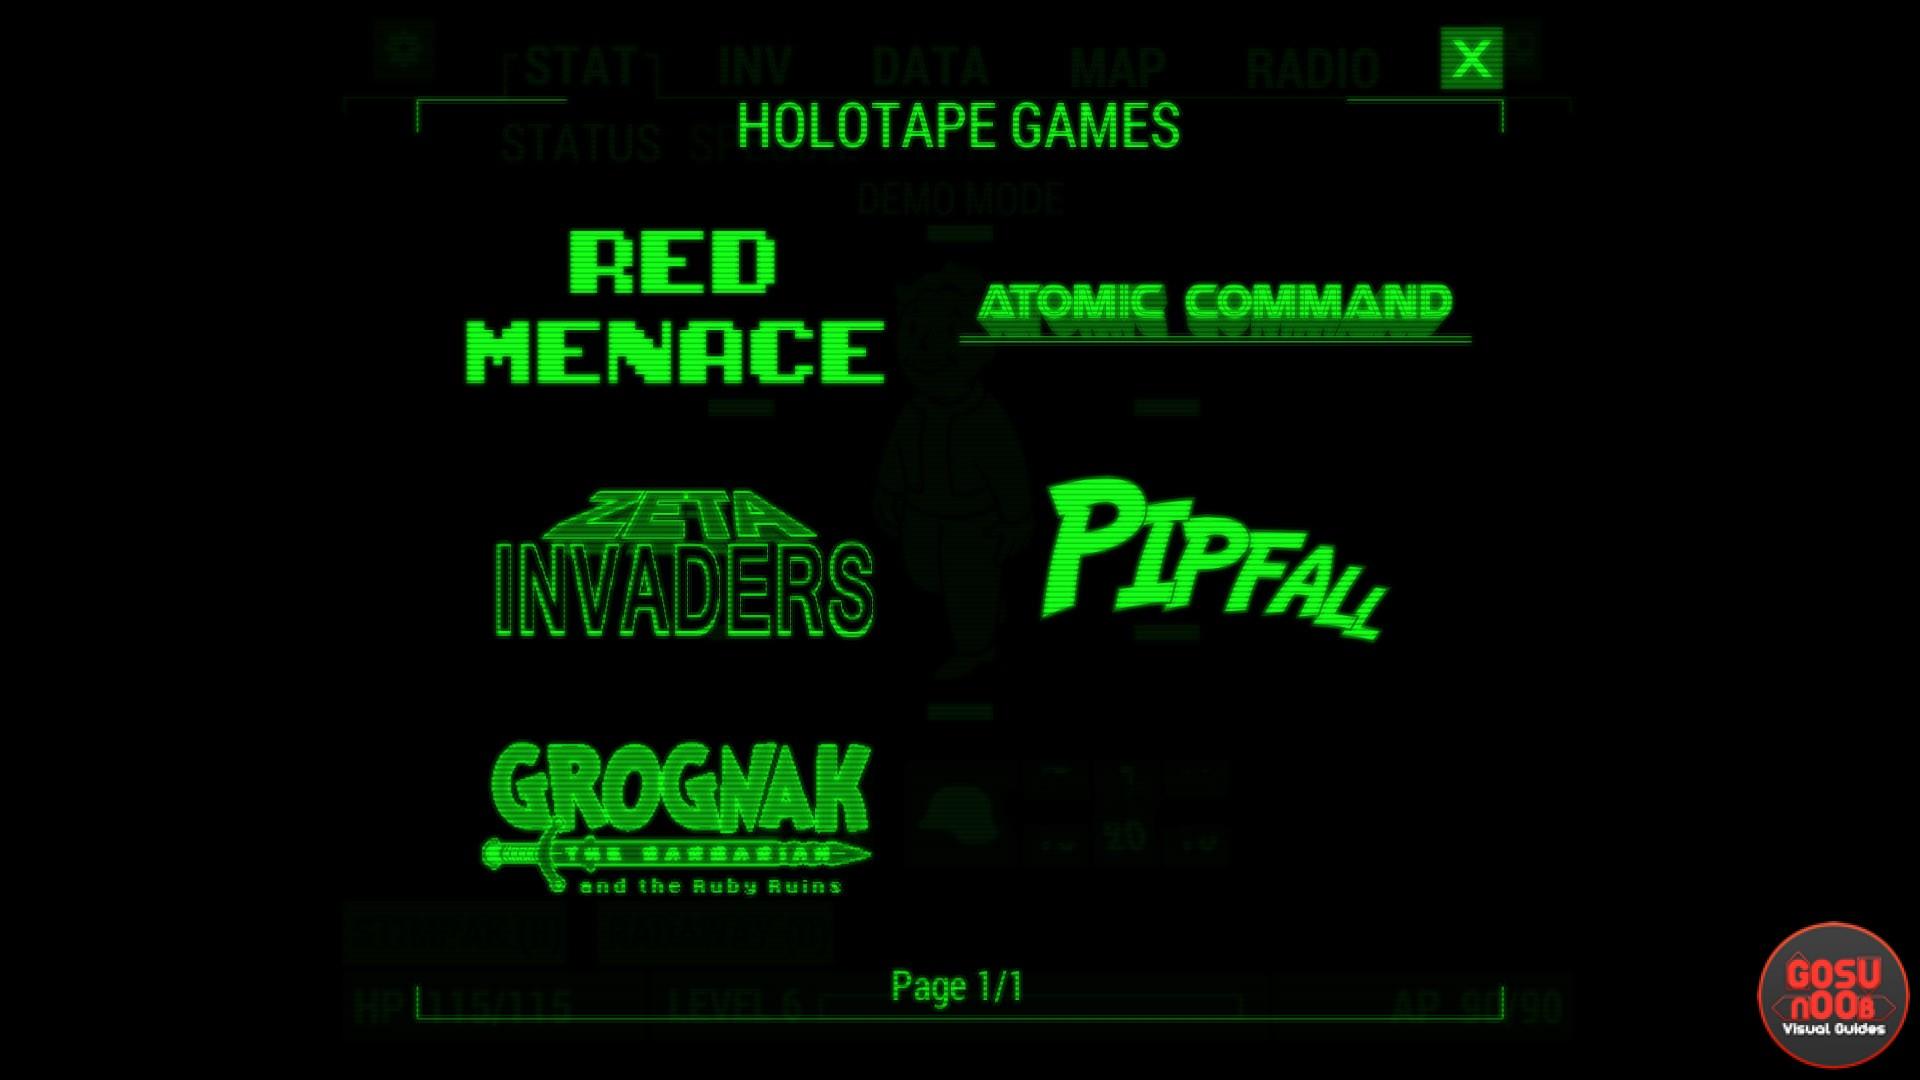 Holotape games fallout 4